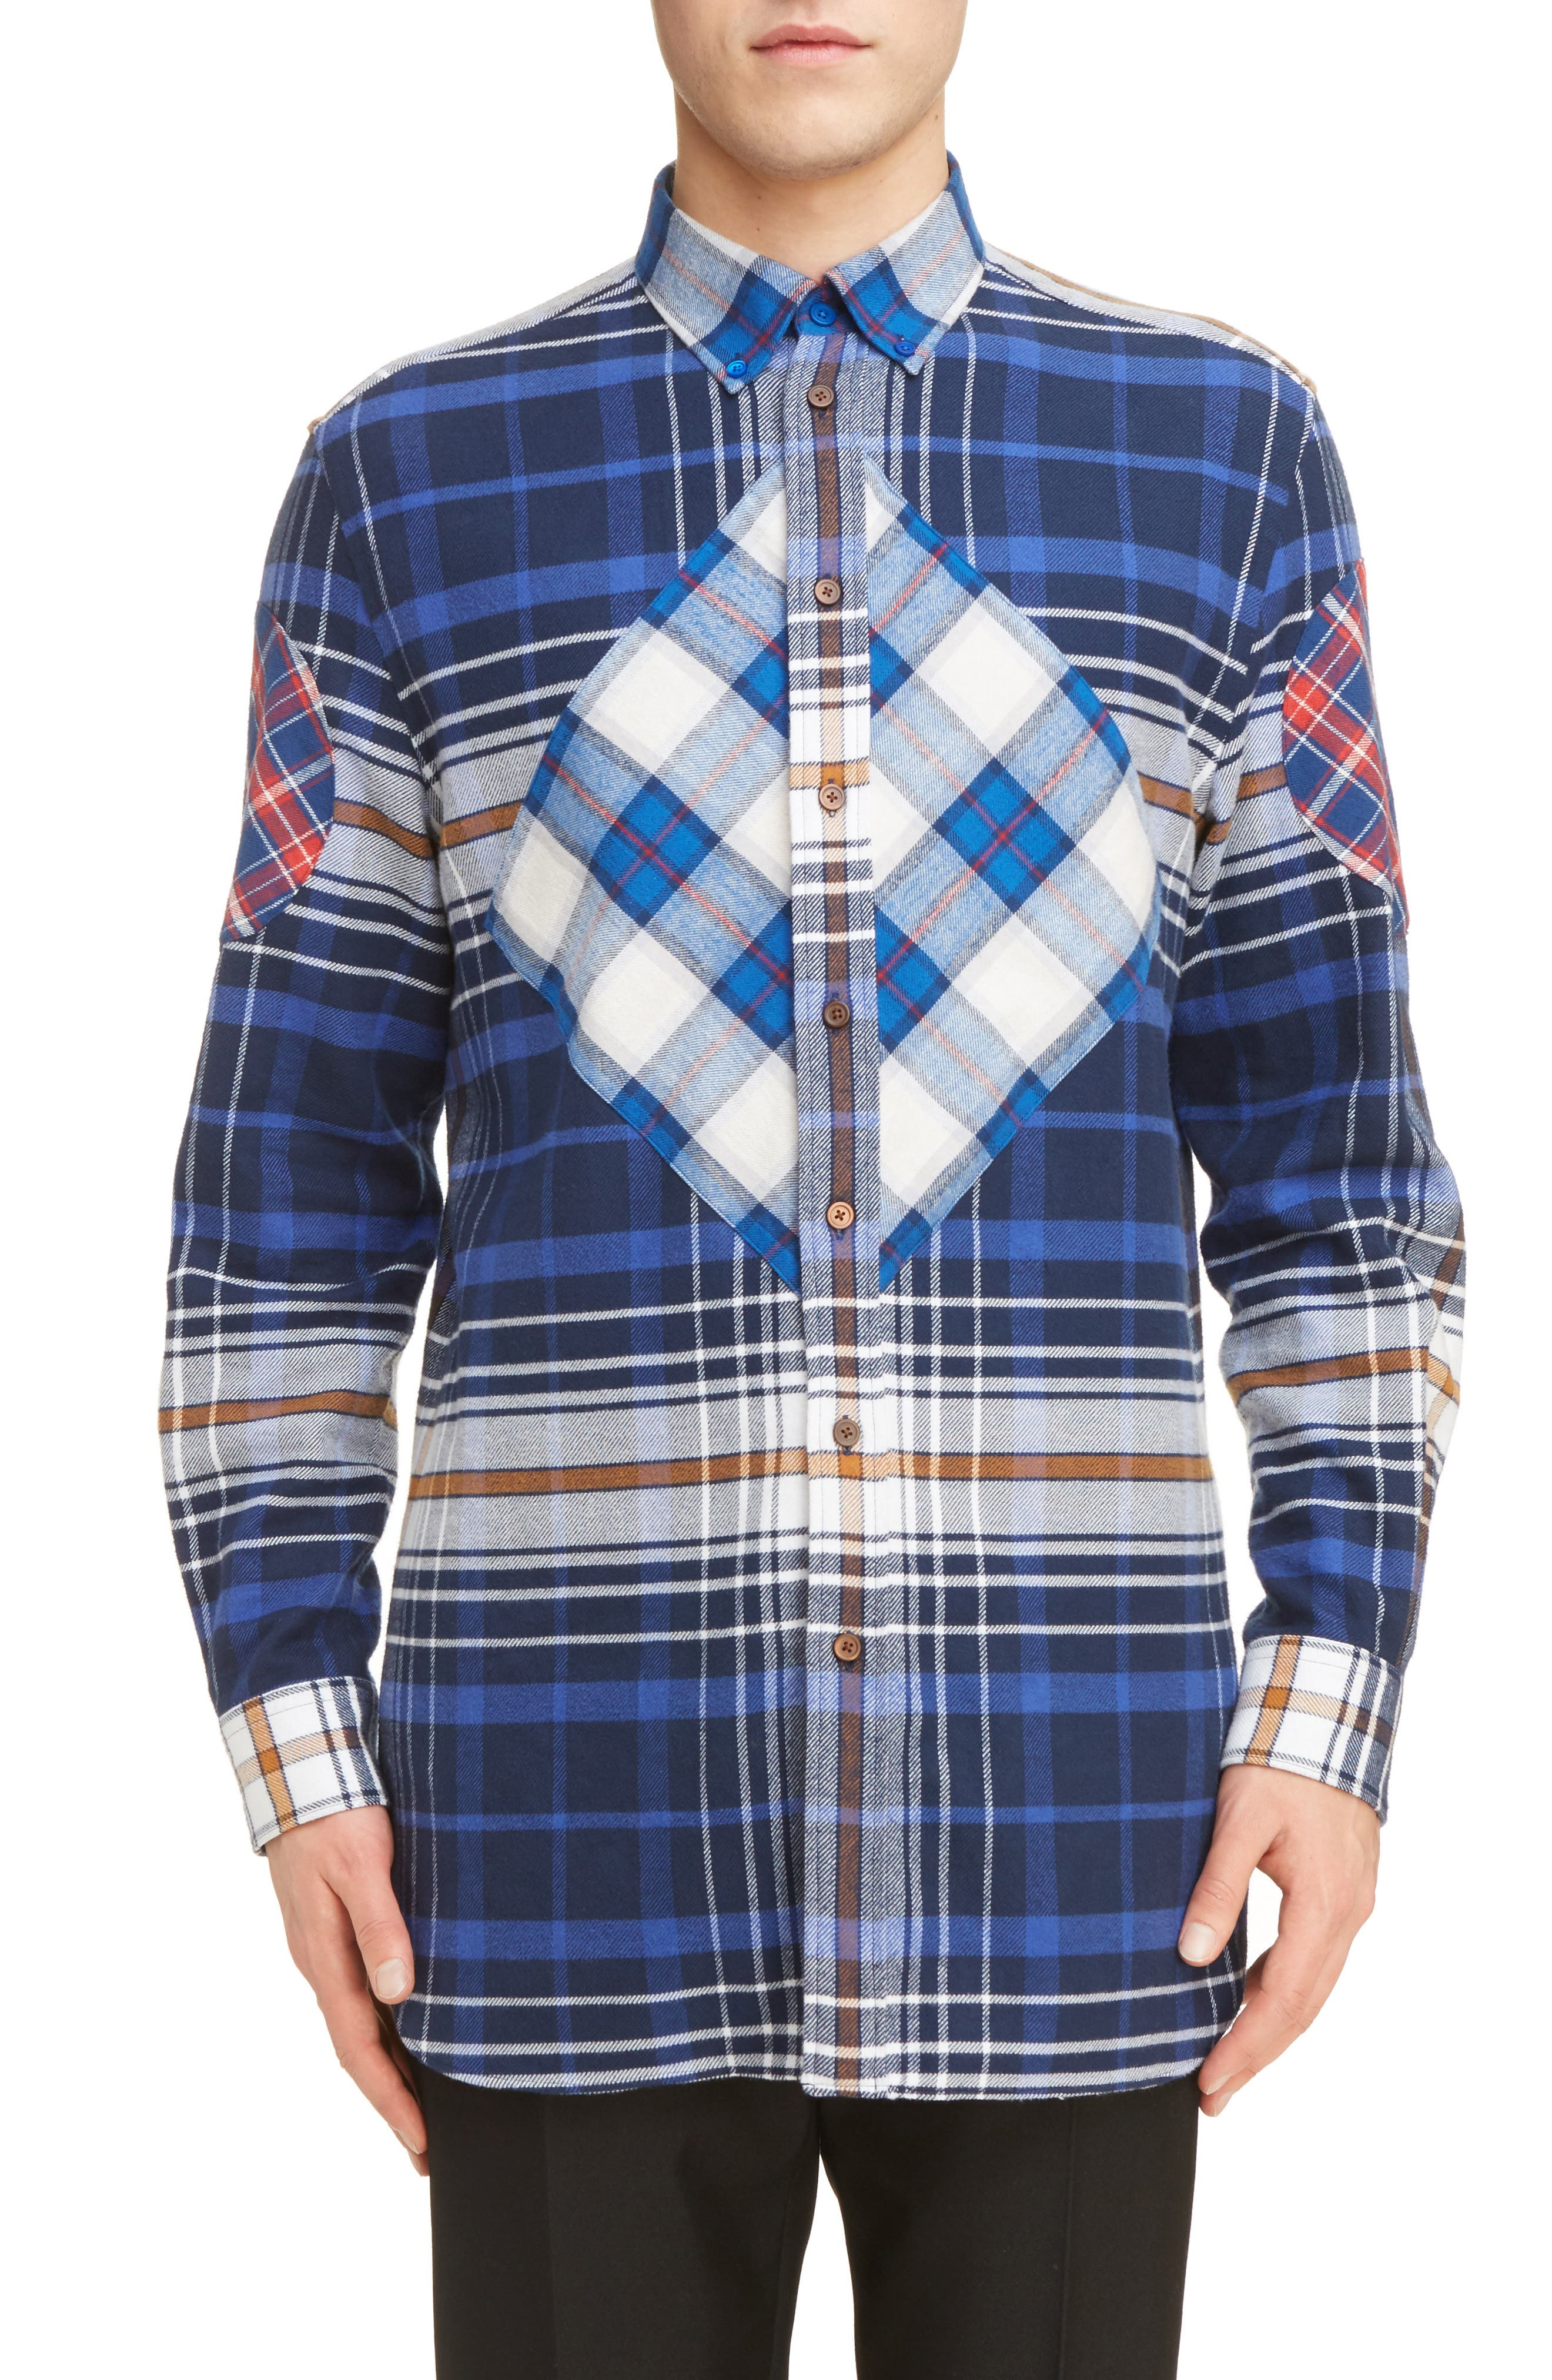 Cuban Fit Pieced Flannel Shirt,                         Main,                         color, Blue Multi